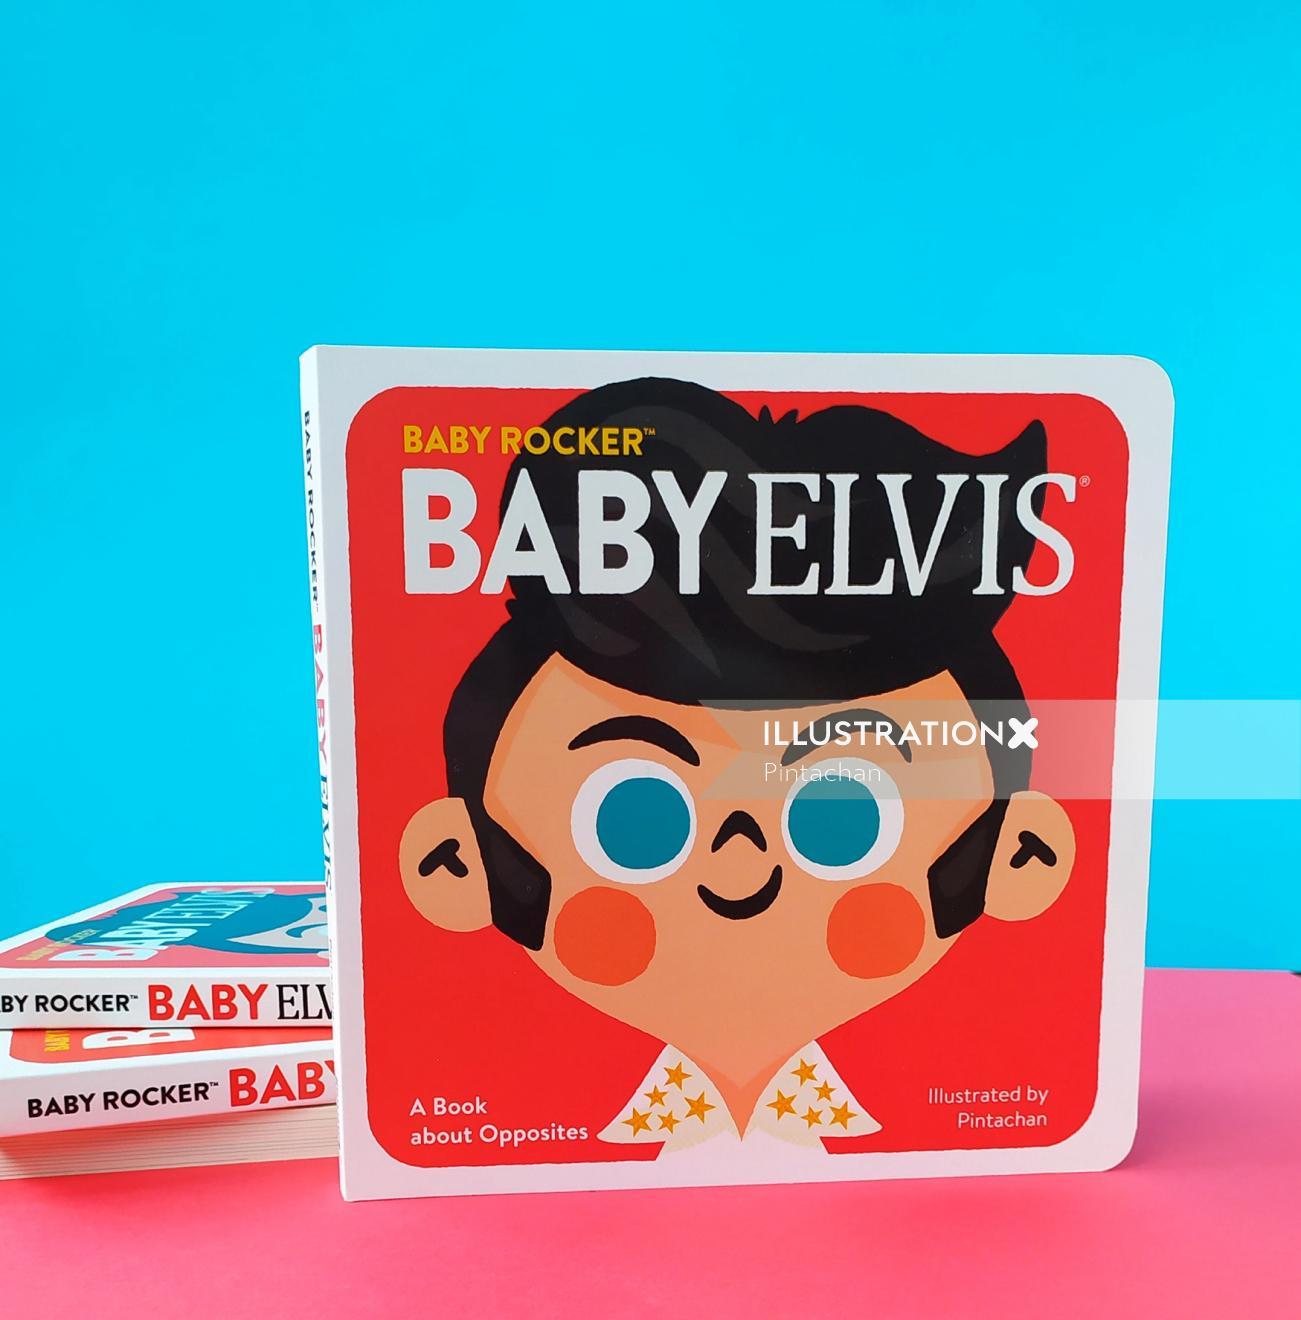 Pintachan's Baby Elvis book illustration